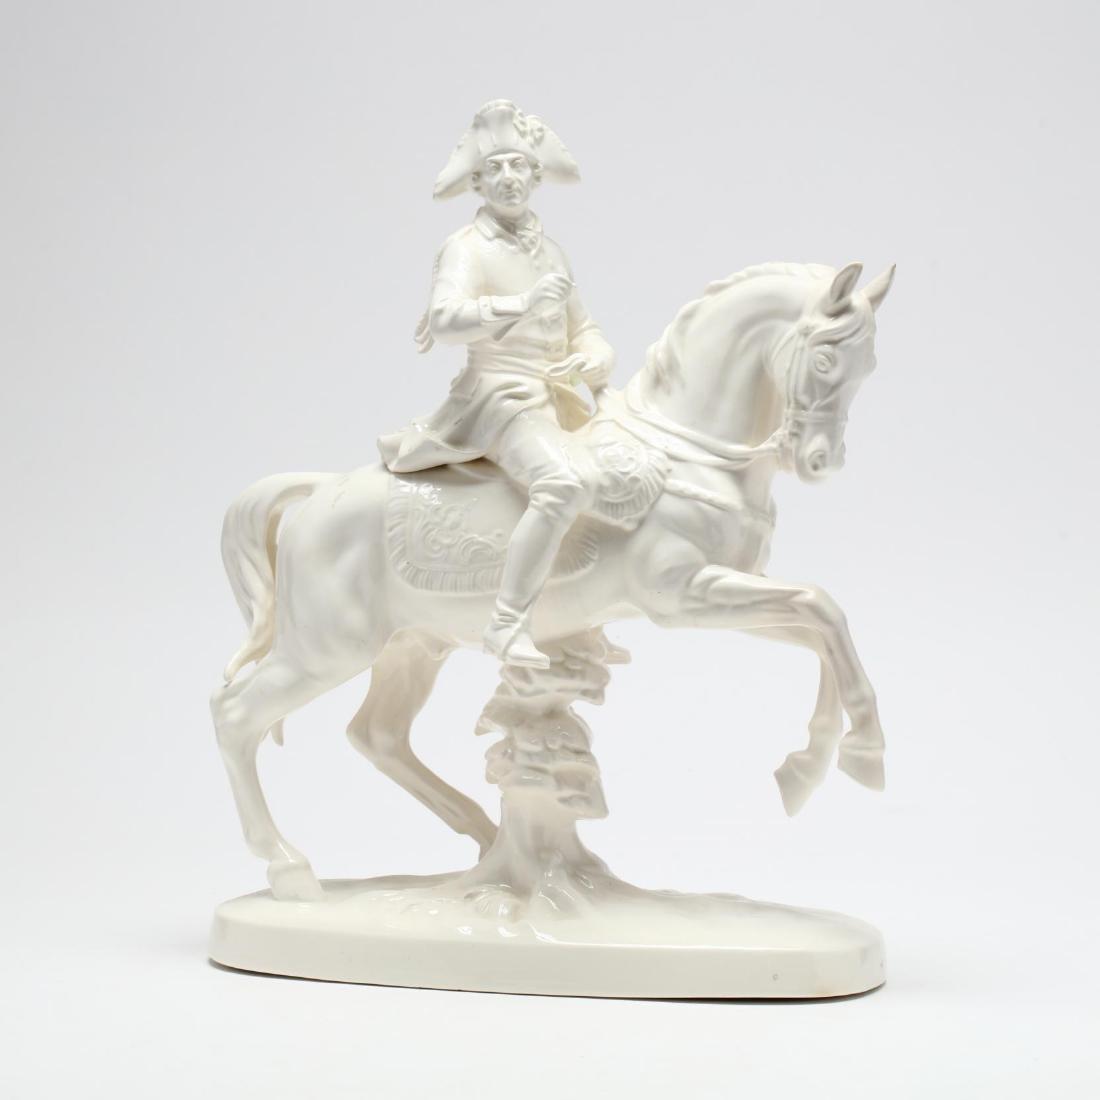 Katzhütte, Porcelain Figure of Fredrick the Great